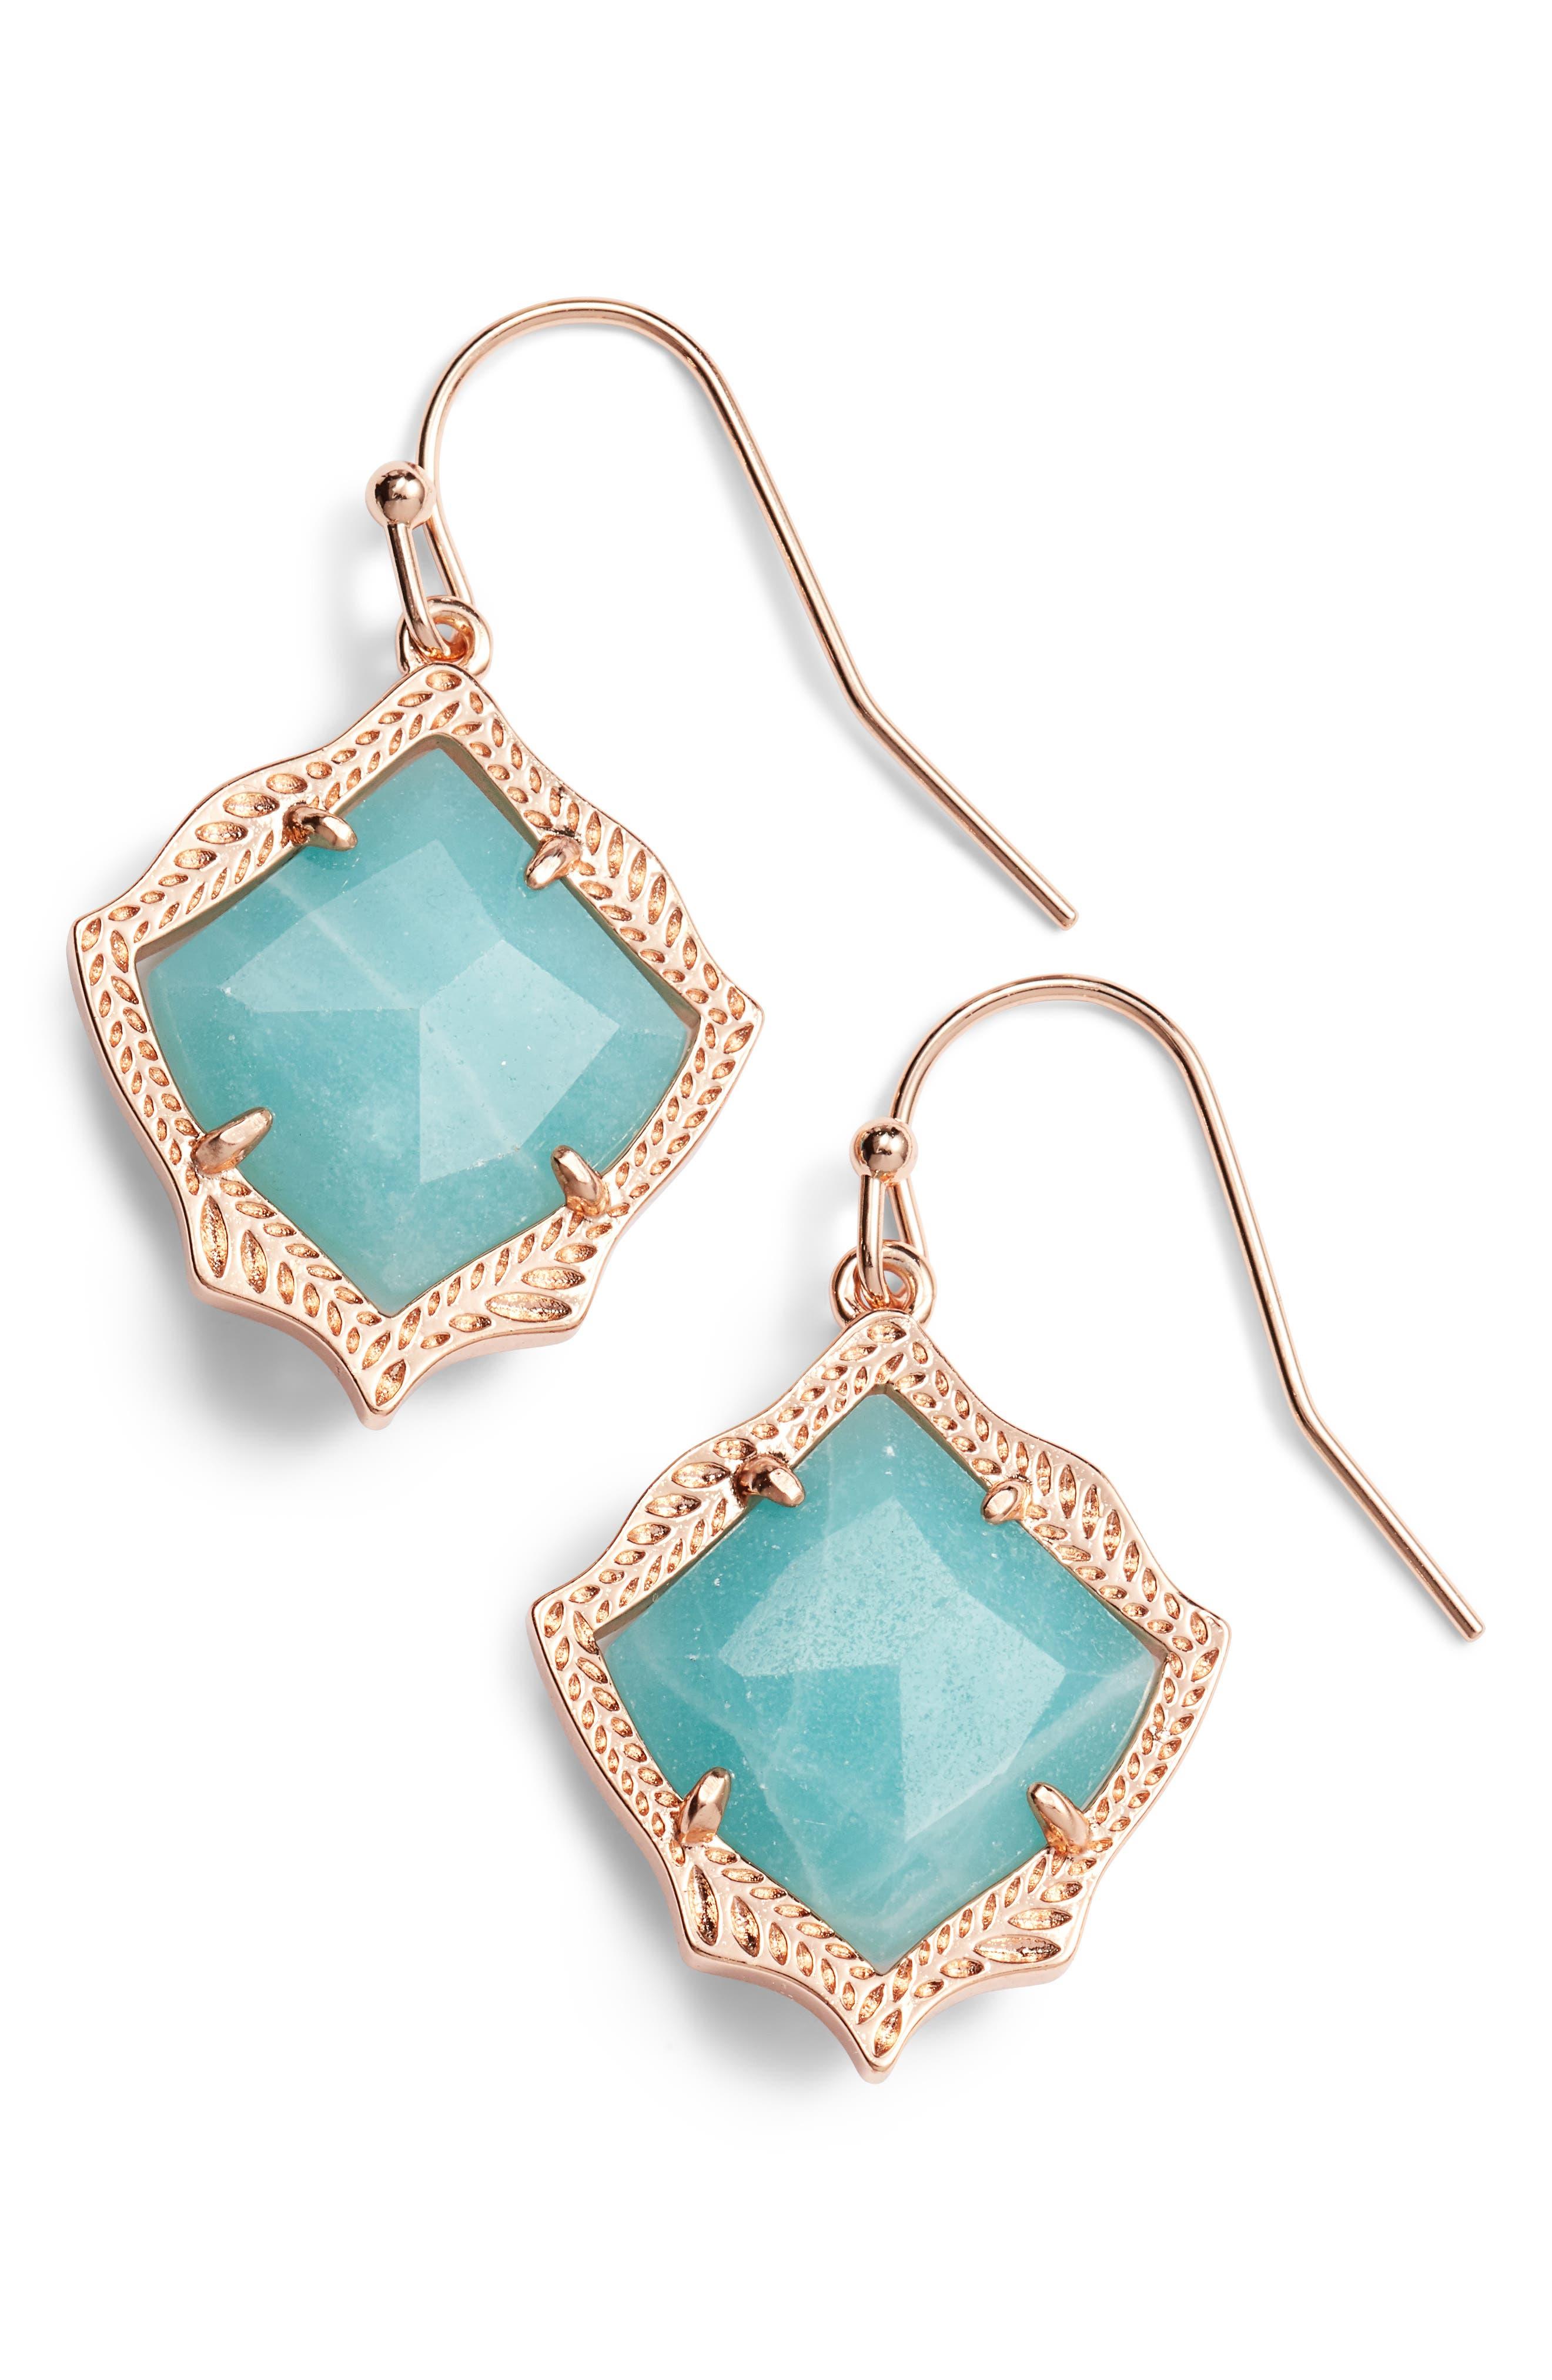 KENDRA SCOTT Kyrie Drop Earrings, Main, color, AMAZONITE/ ROSE GOLD